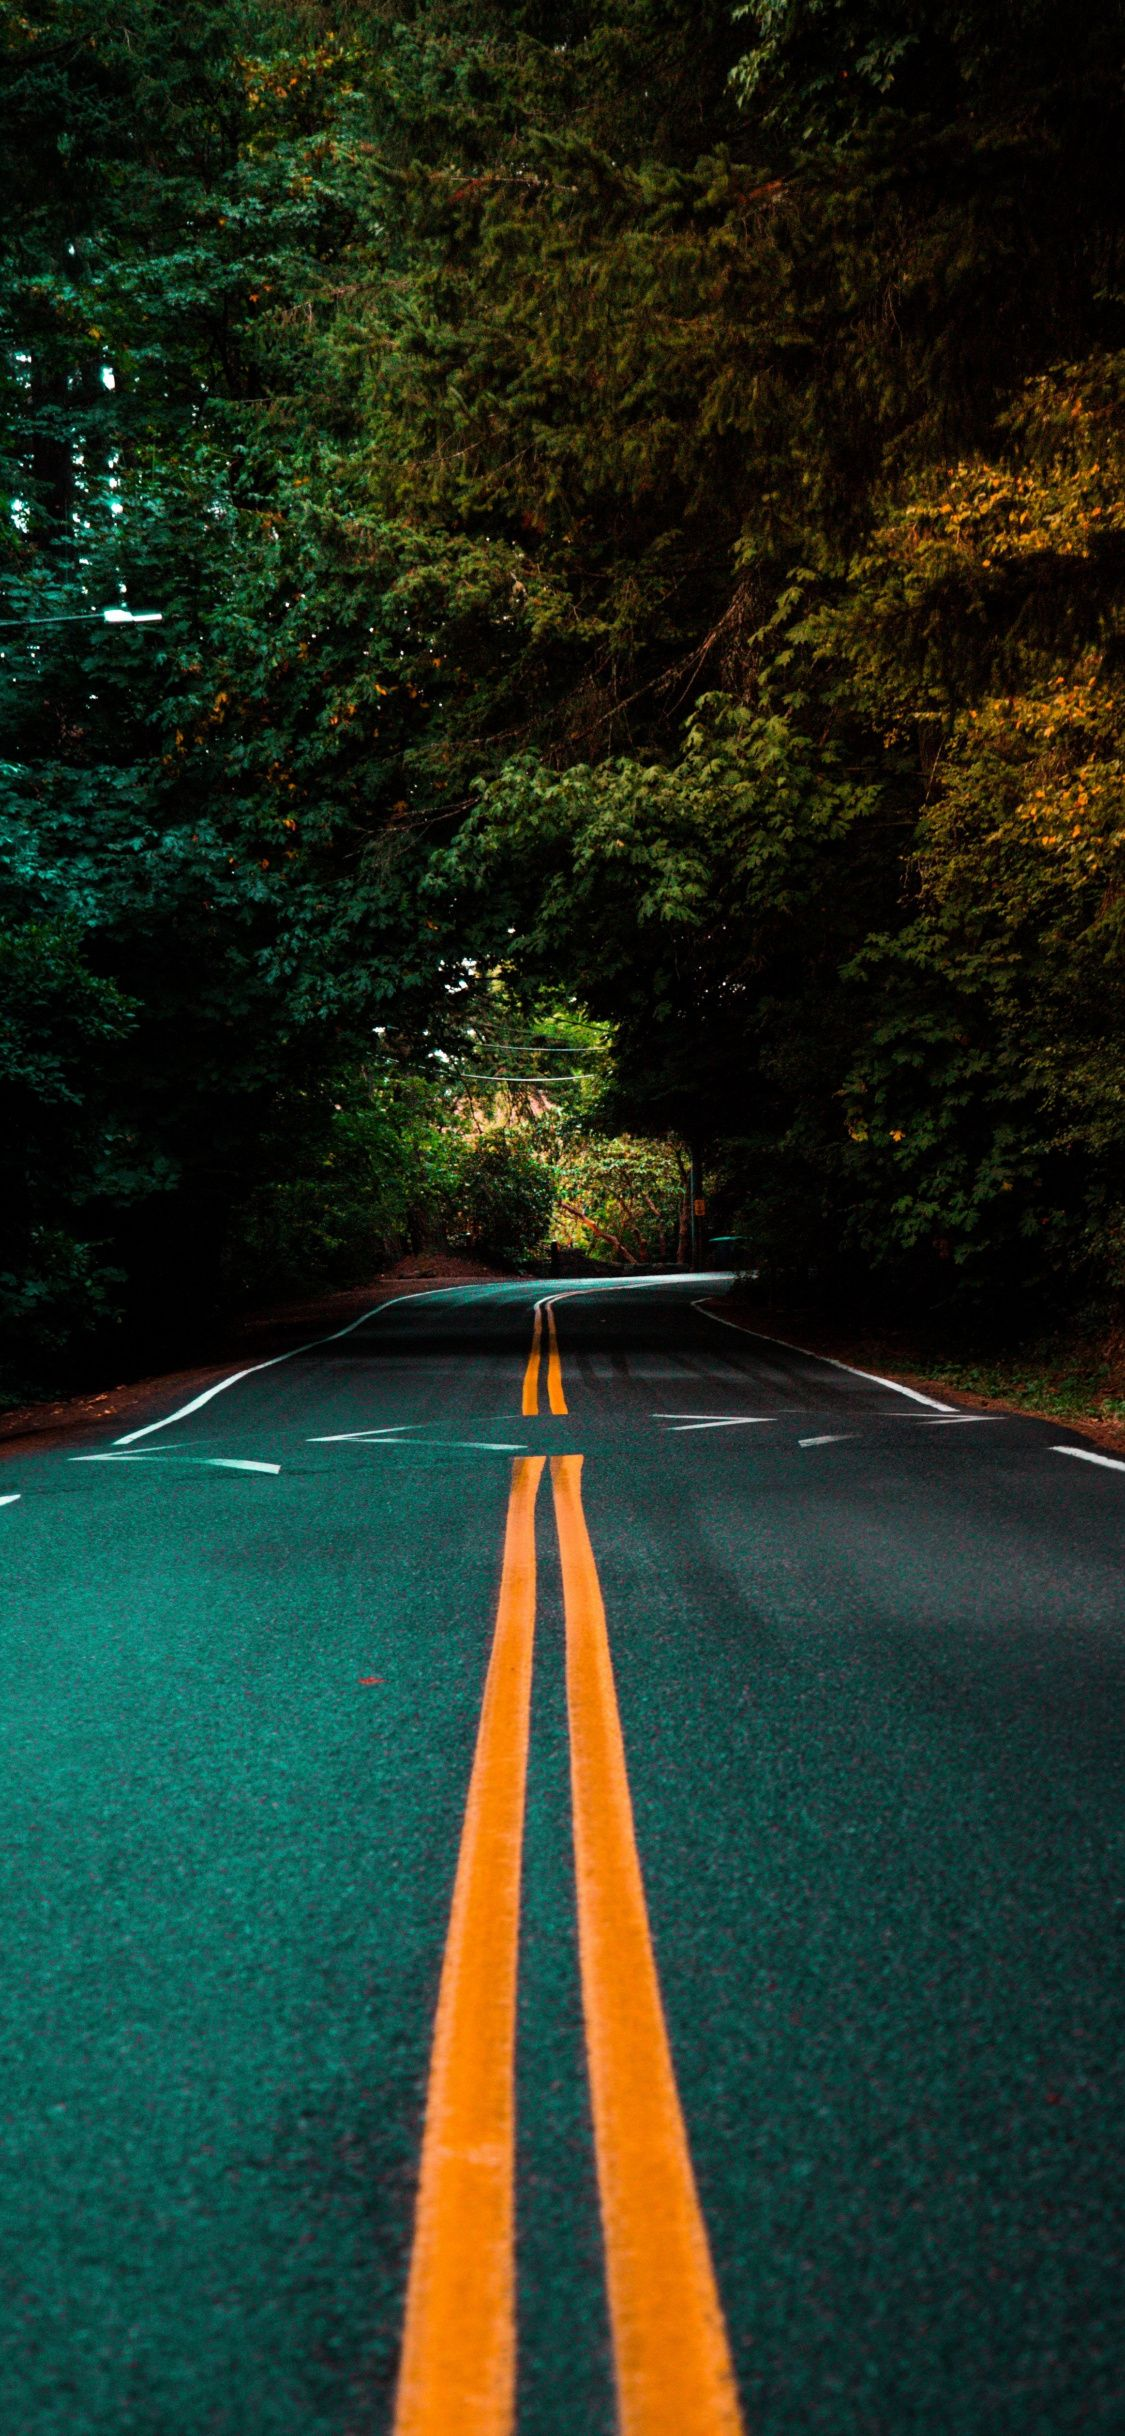 Yellow Marks Highway Road Asphalt 1125x2436 Wallpaper Blur Background Photography Picsart Background Dslr Background Images